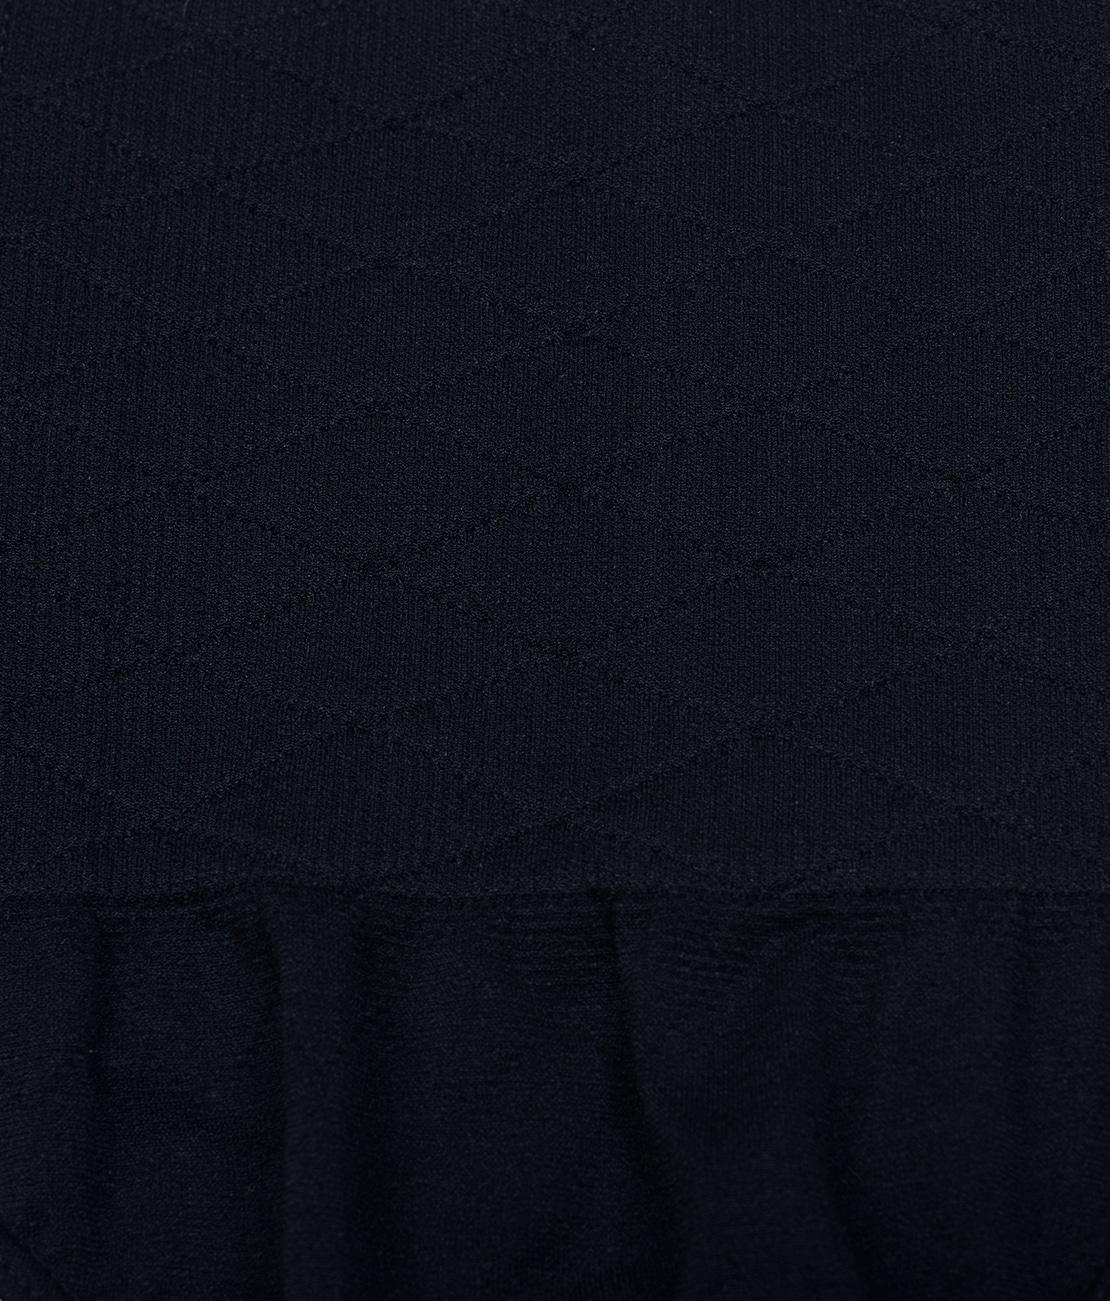 String Amincissant Noir Packshot Detail 1